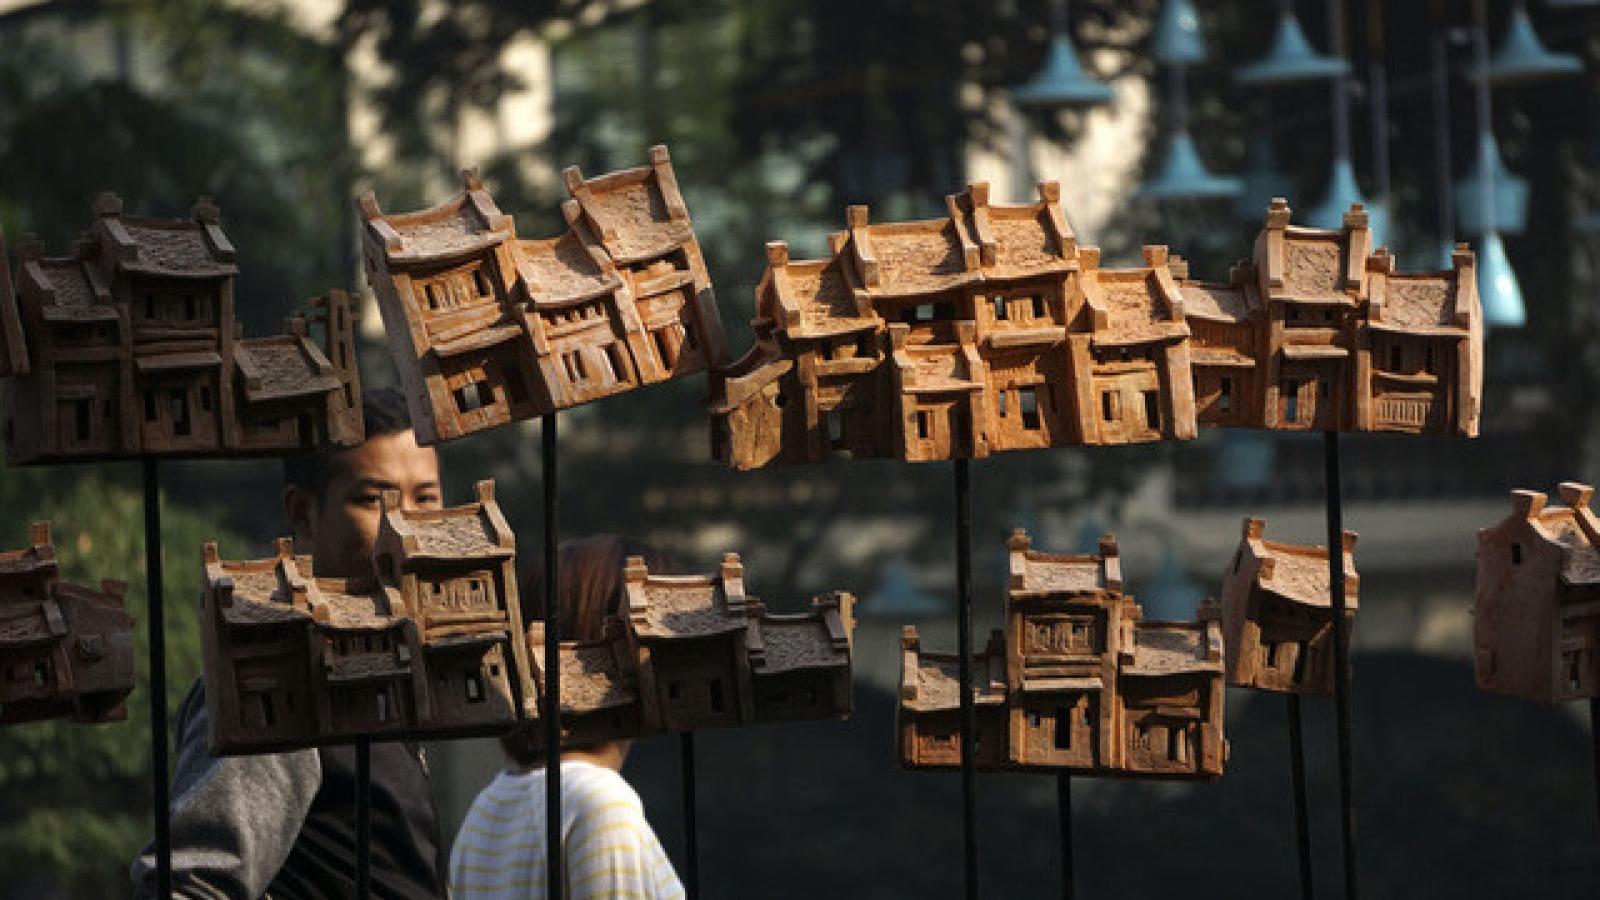 Hanoi handicrafts: Art in everyday lives